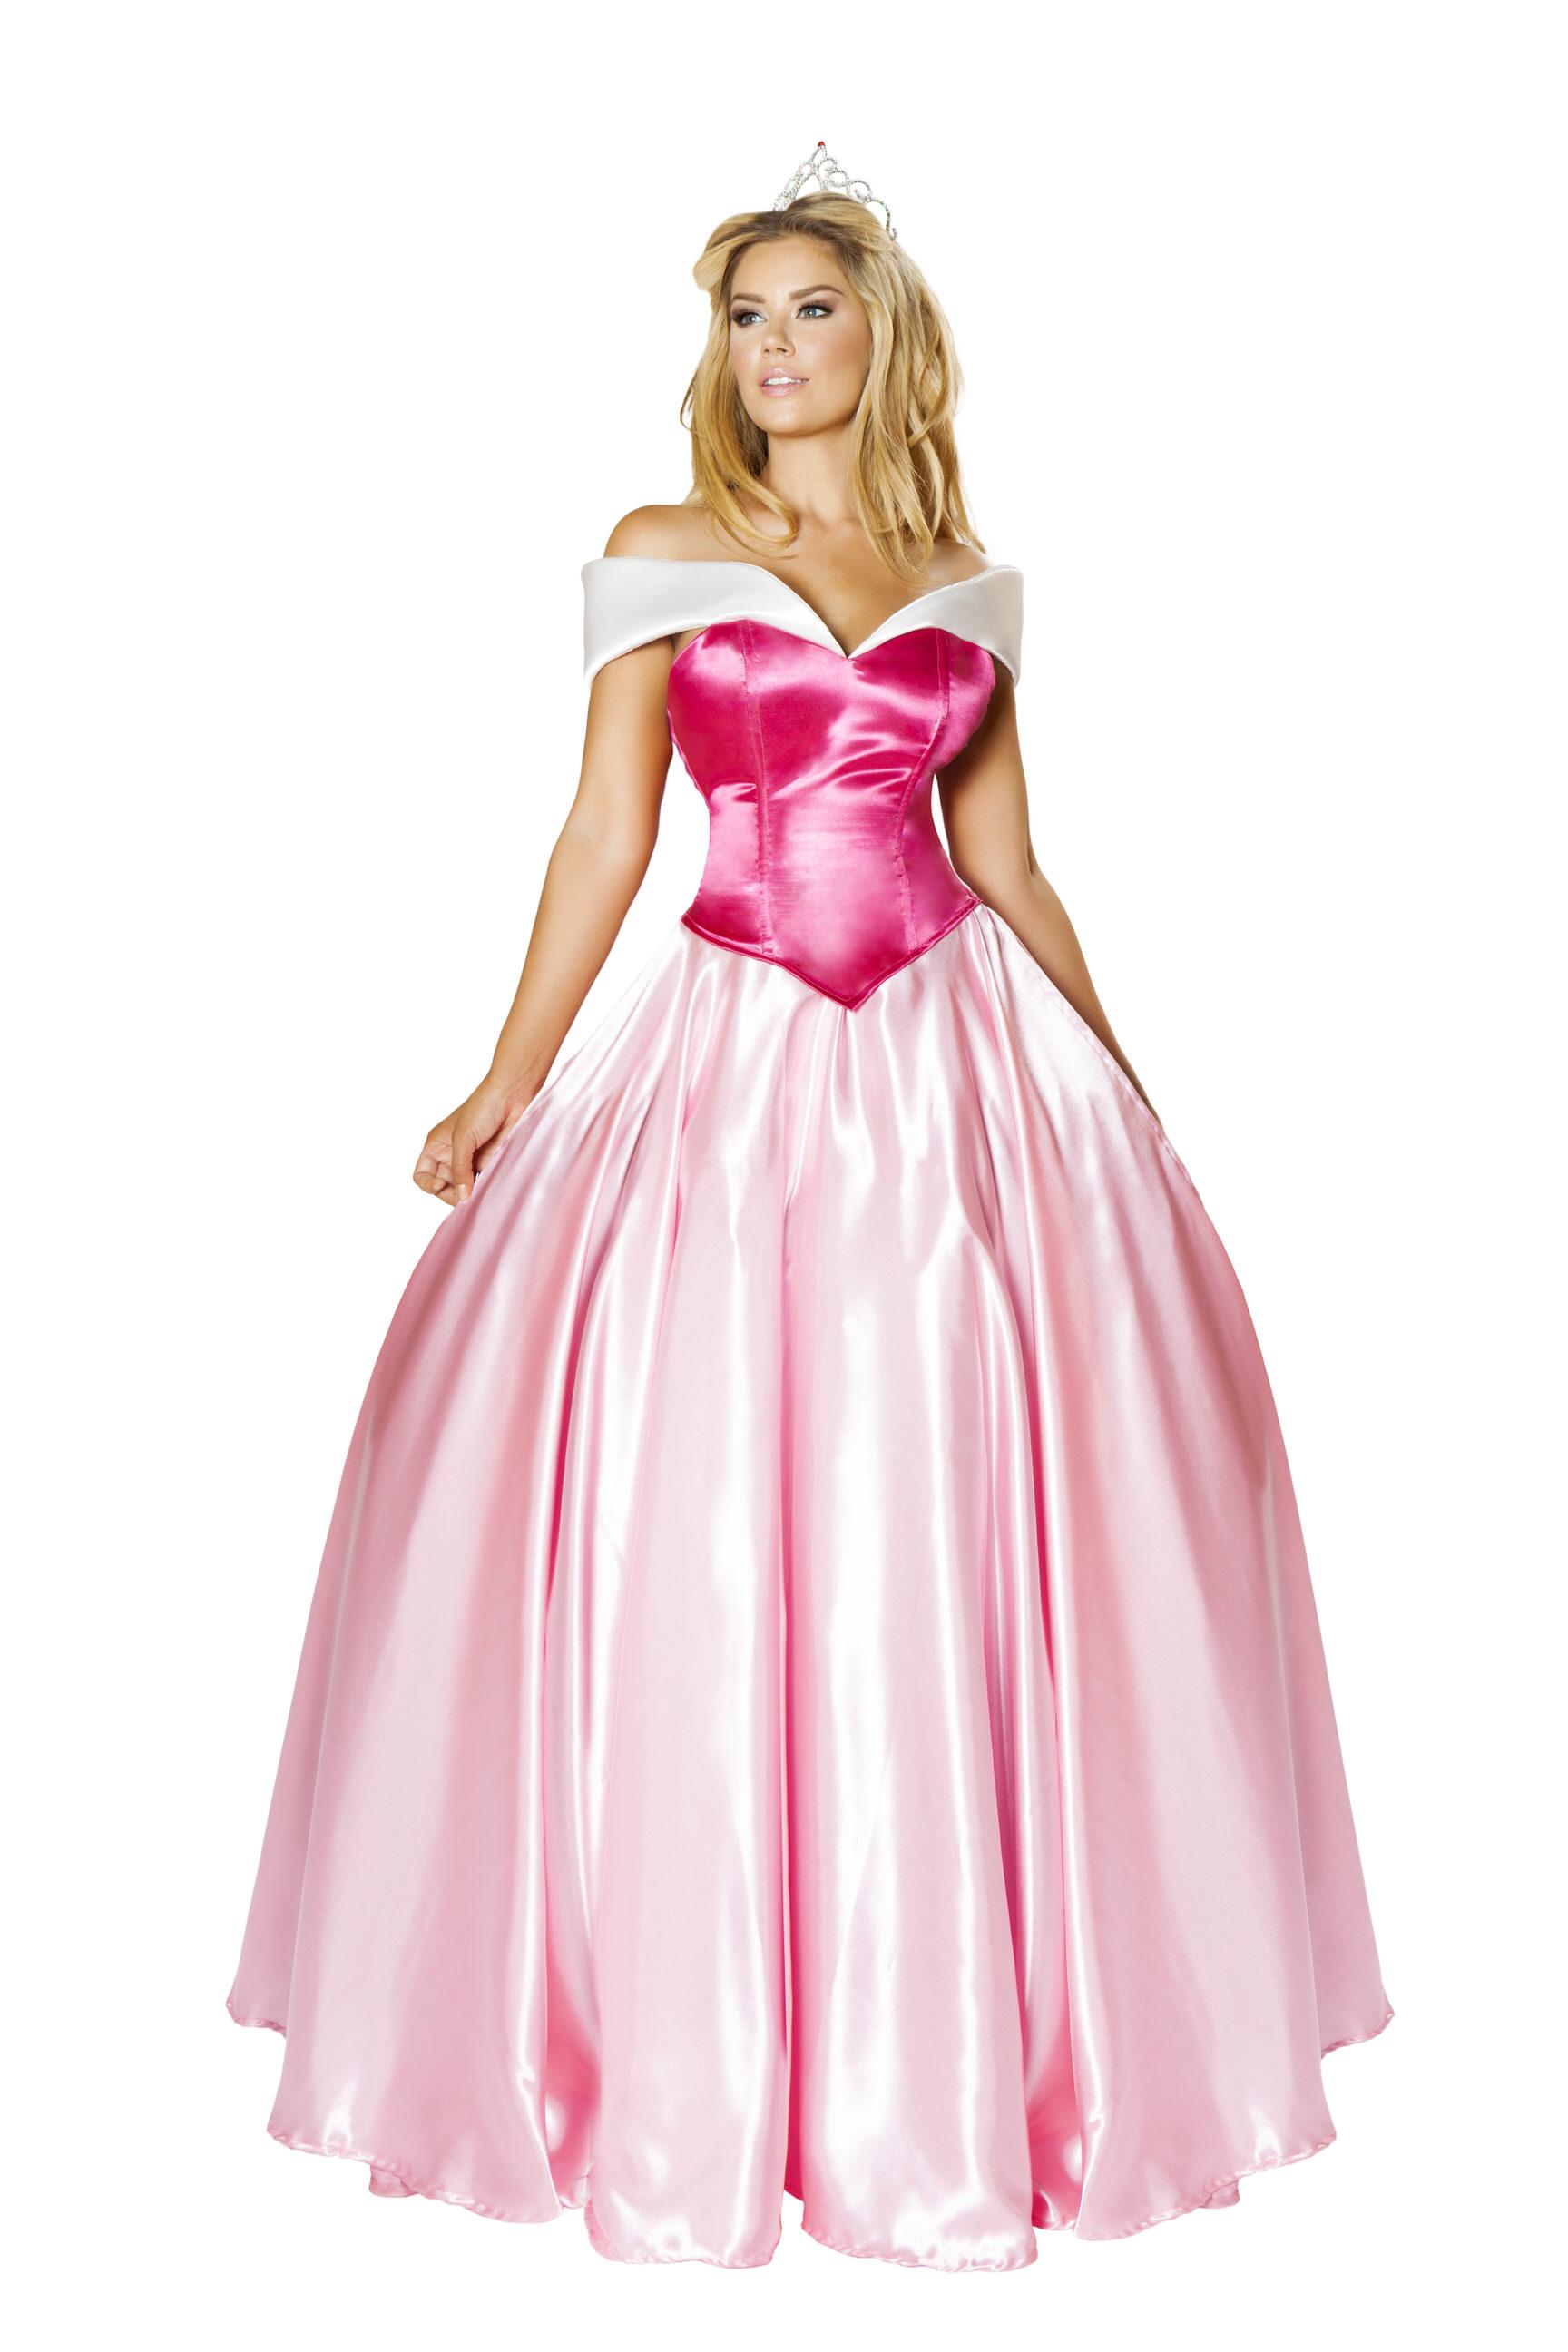 Enchanting Sleeping Princess Gown